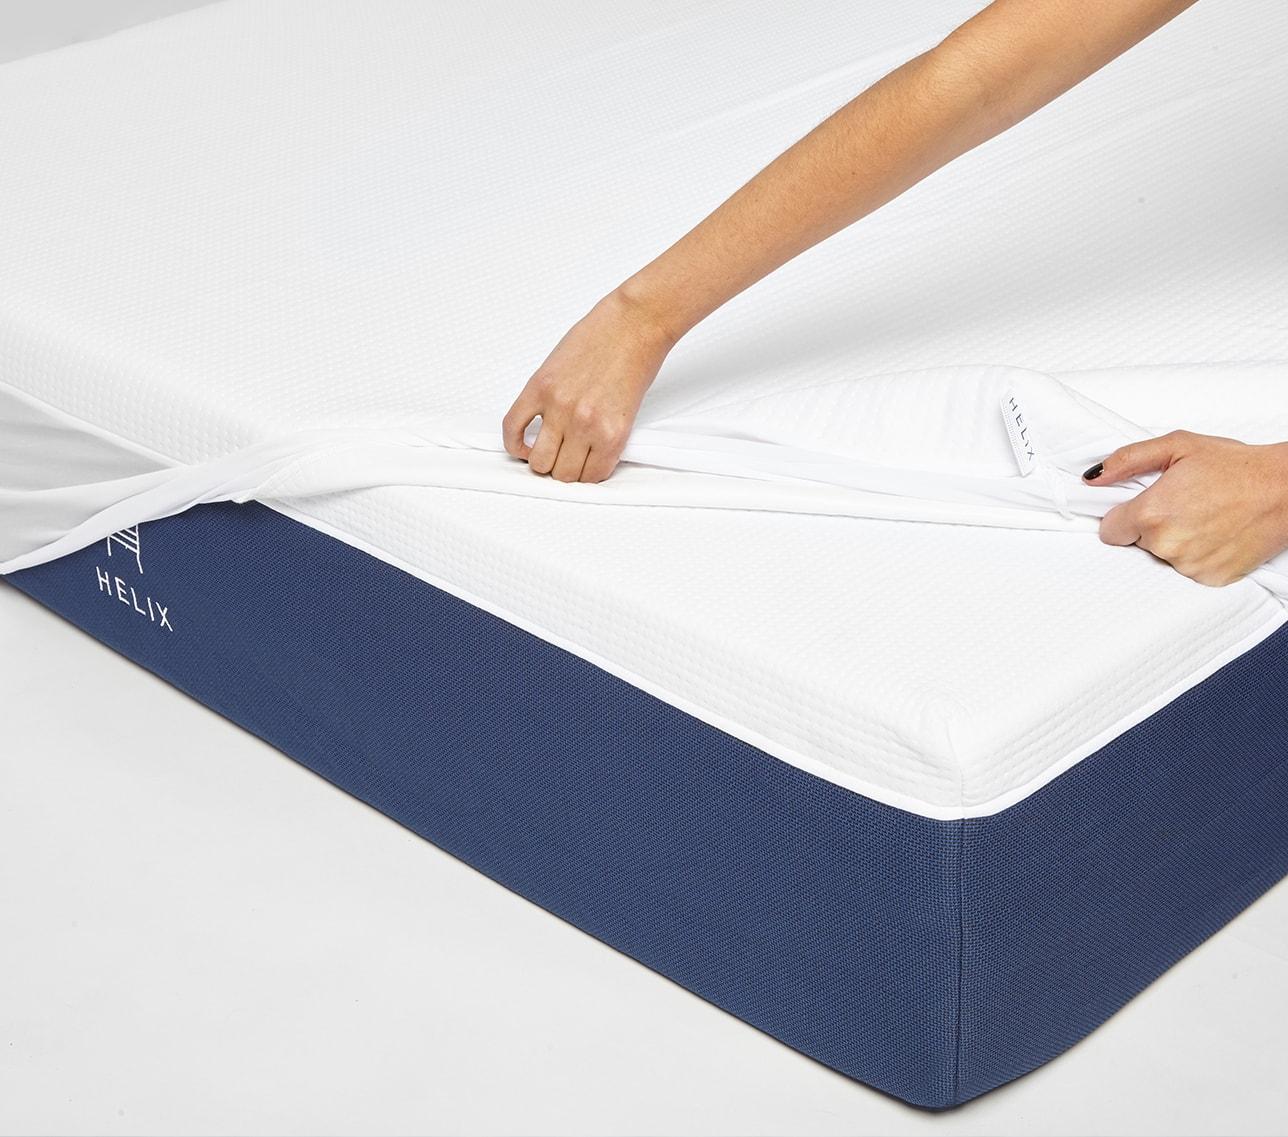 helix mattress protector